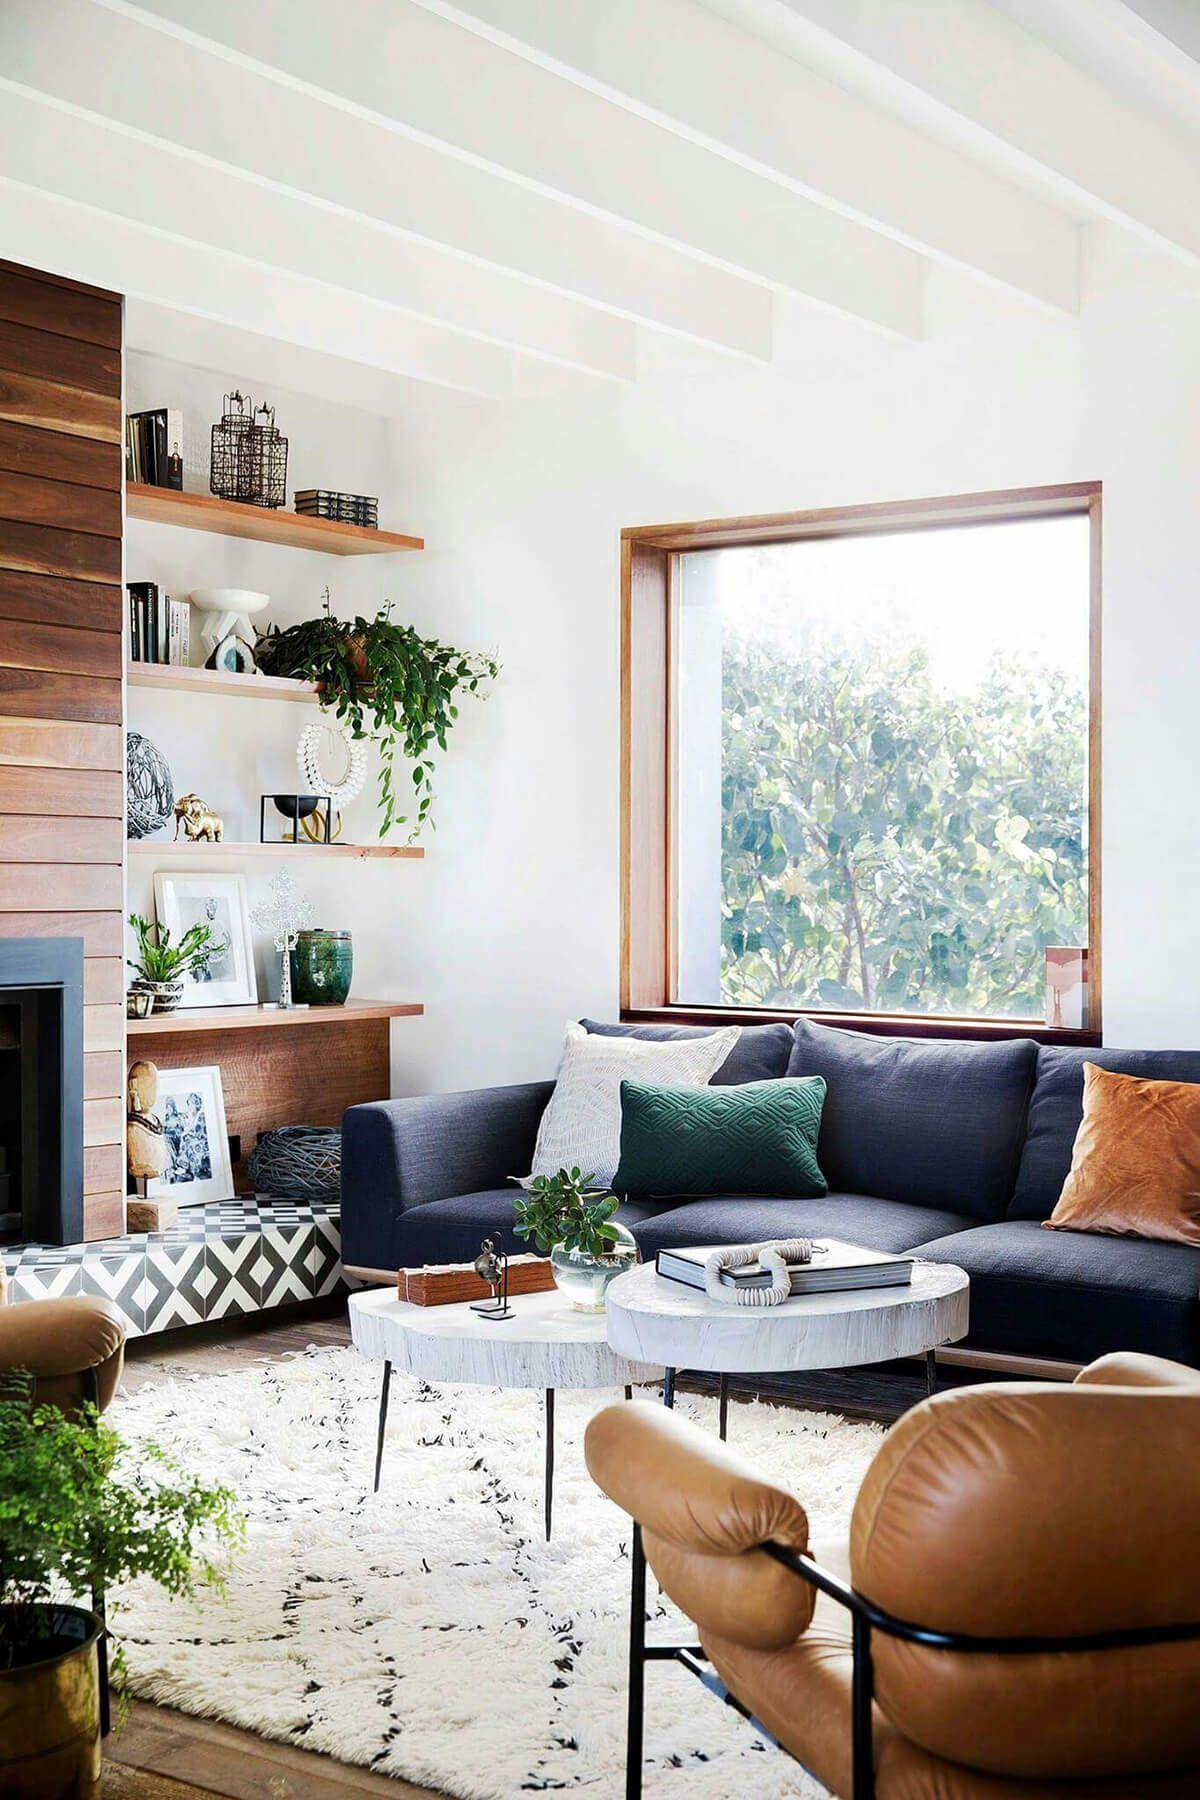 70 Trendy Living Room Ideas 2021 In 2020 Modern Farmhouse Living Room Decor Modern Furniture Living Room Trendy Living Rooms